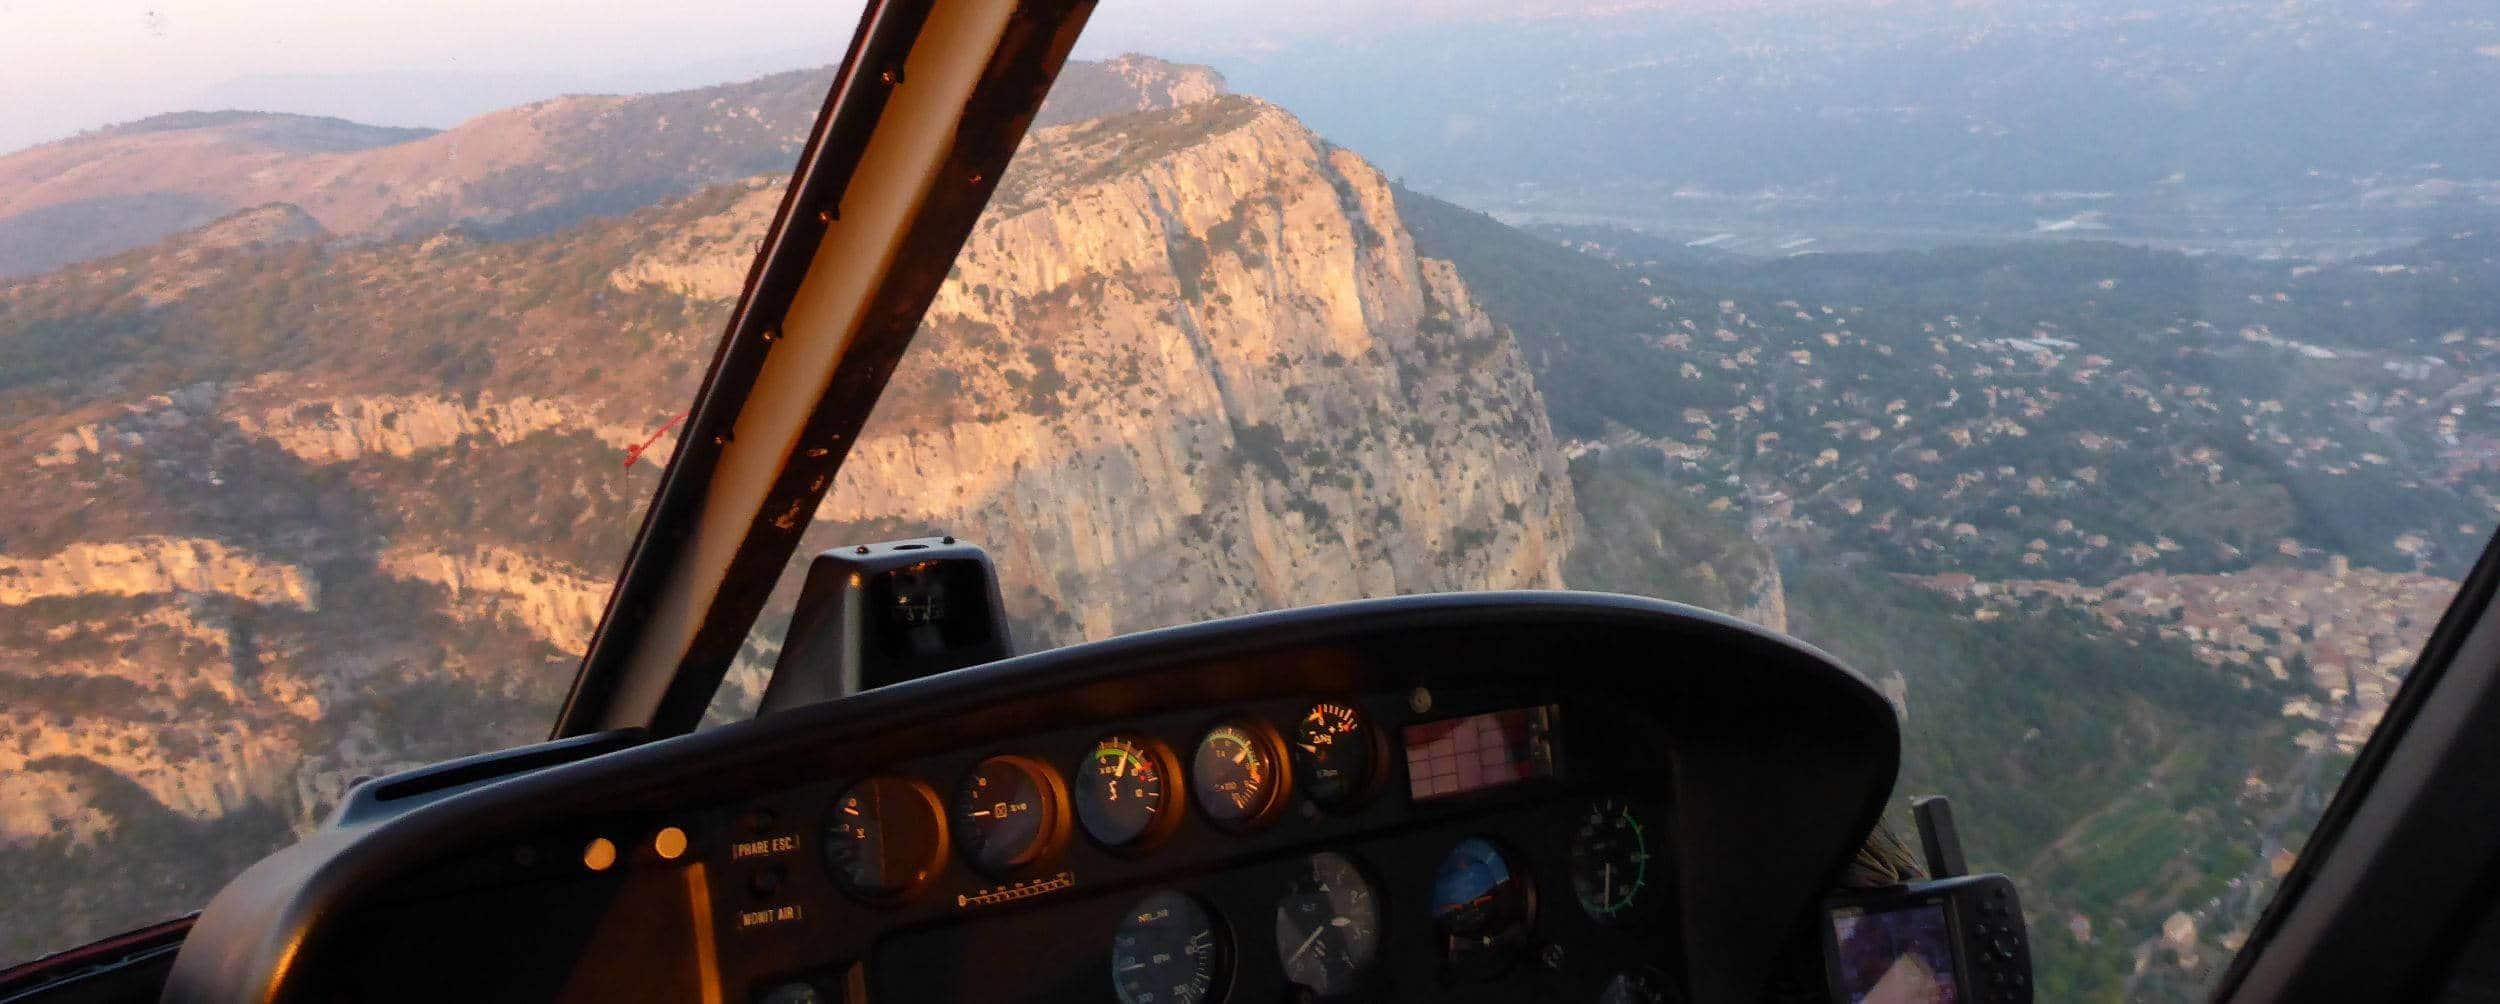 Helicopter transportation - Lesgeckos